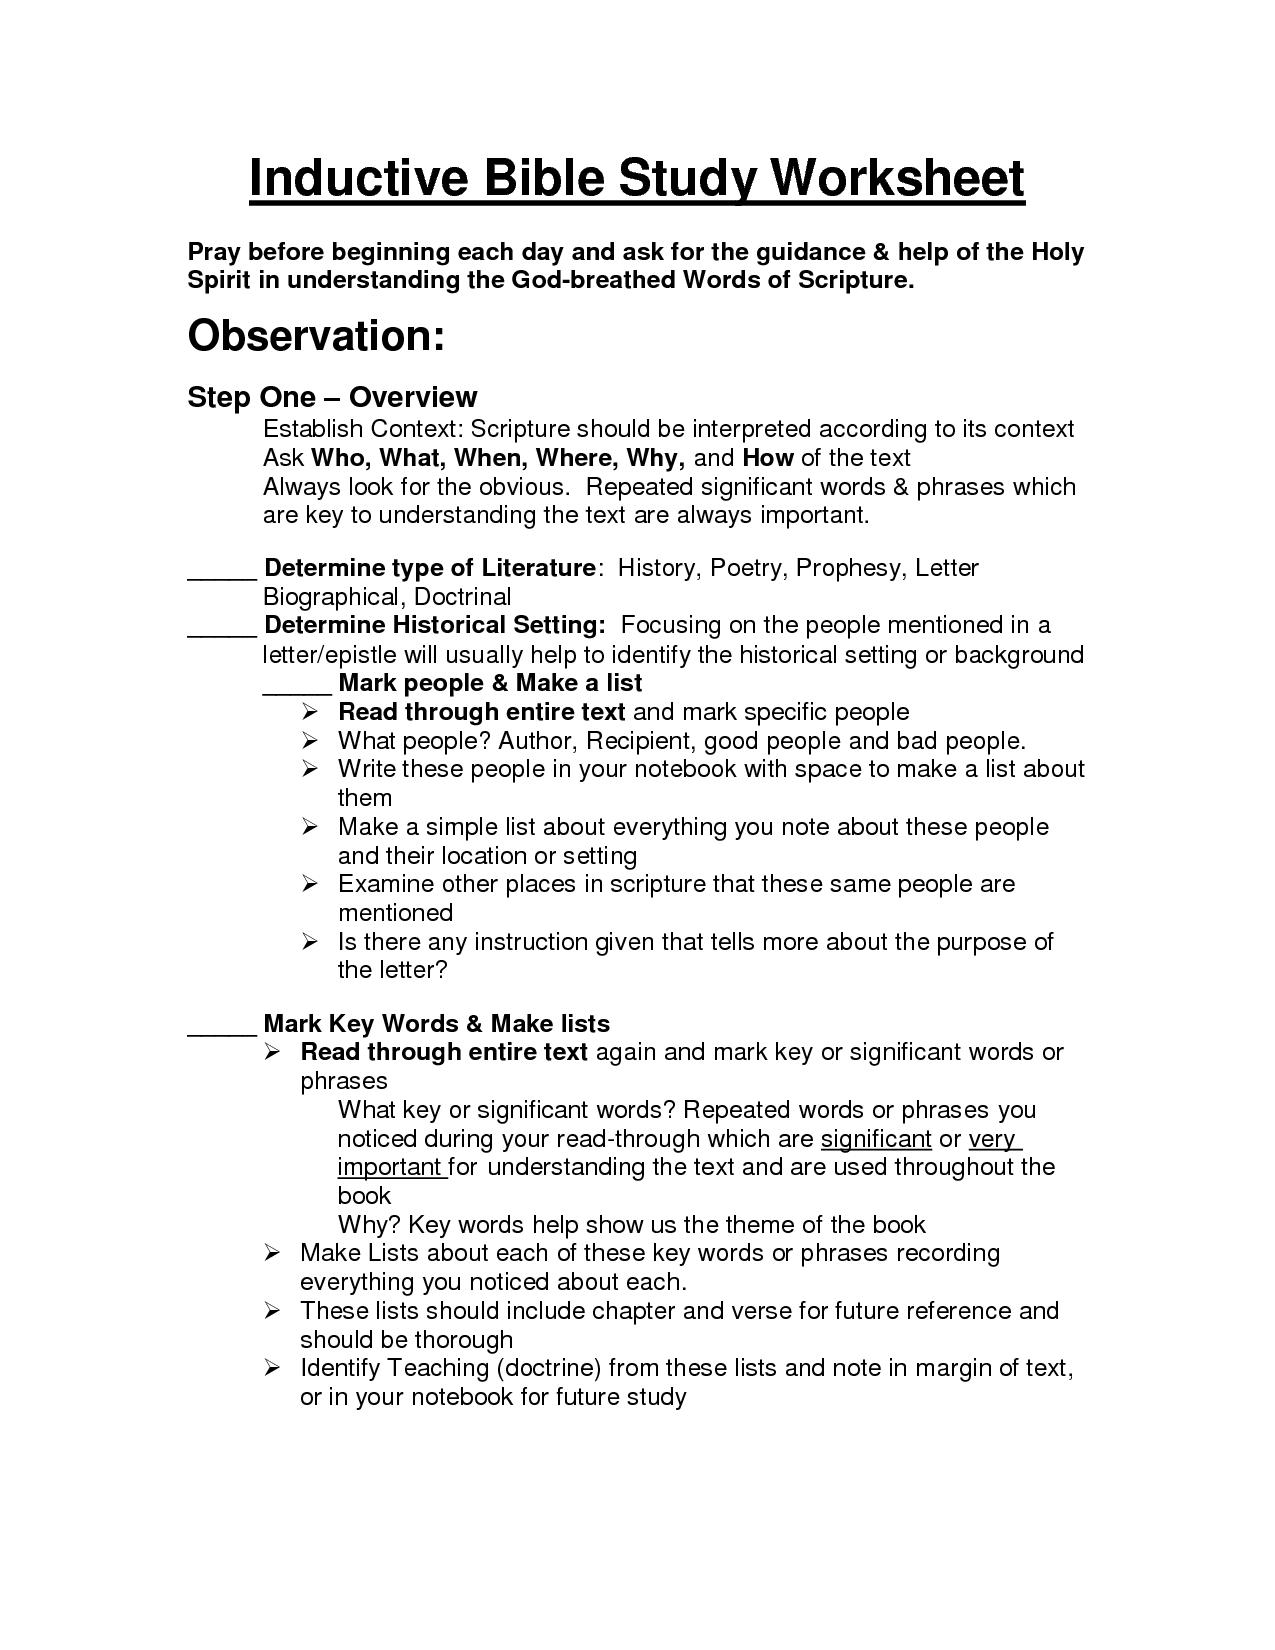 Bible Study Worksheet